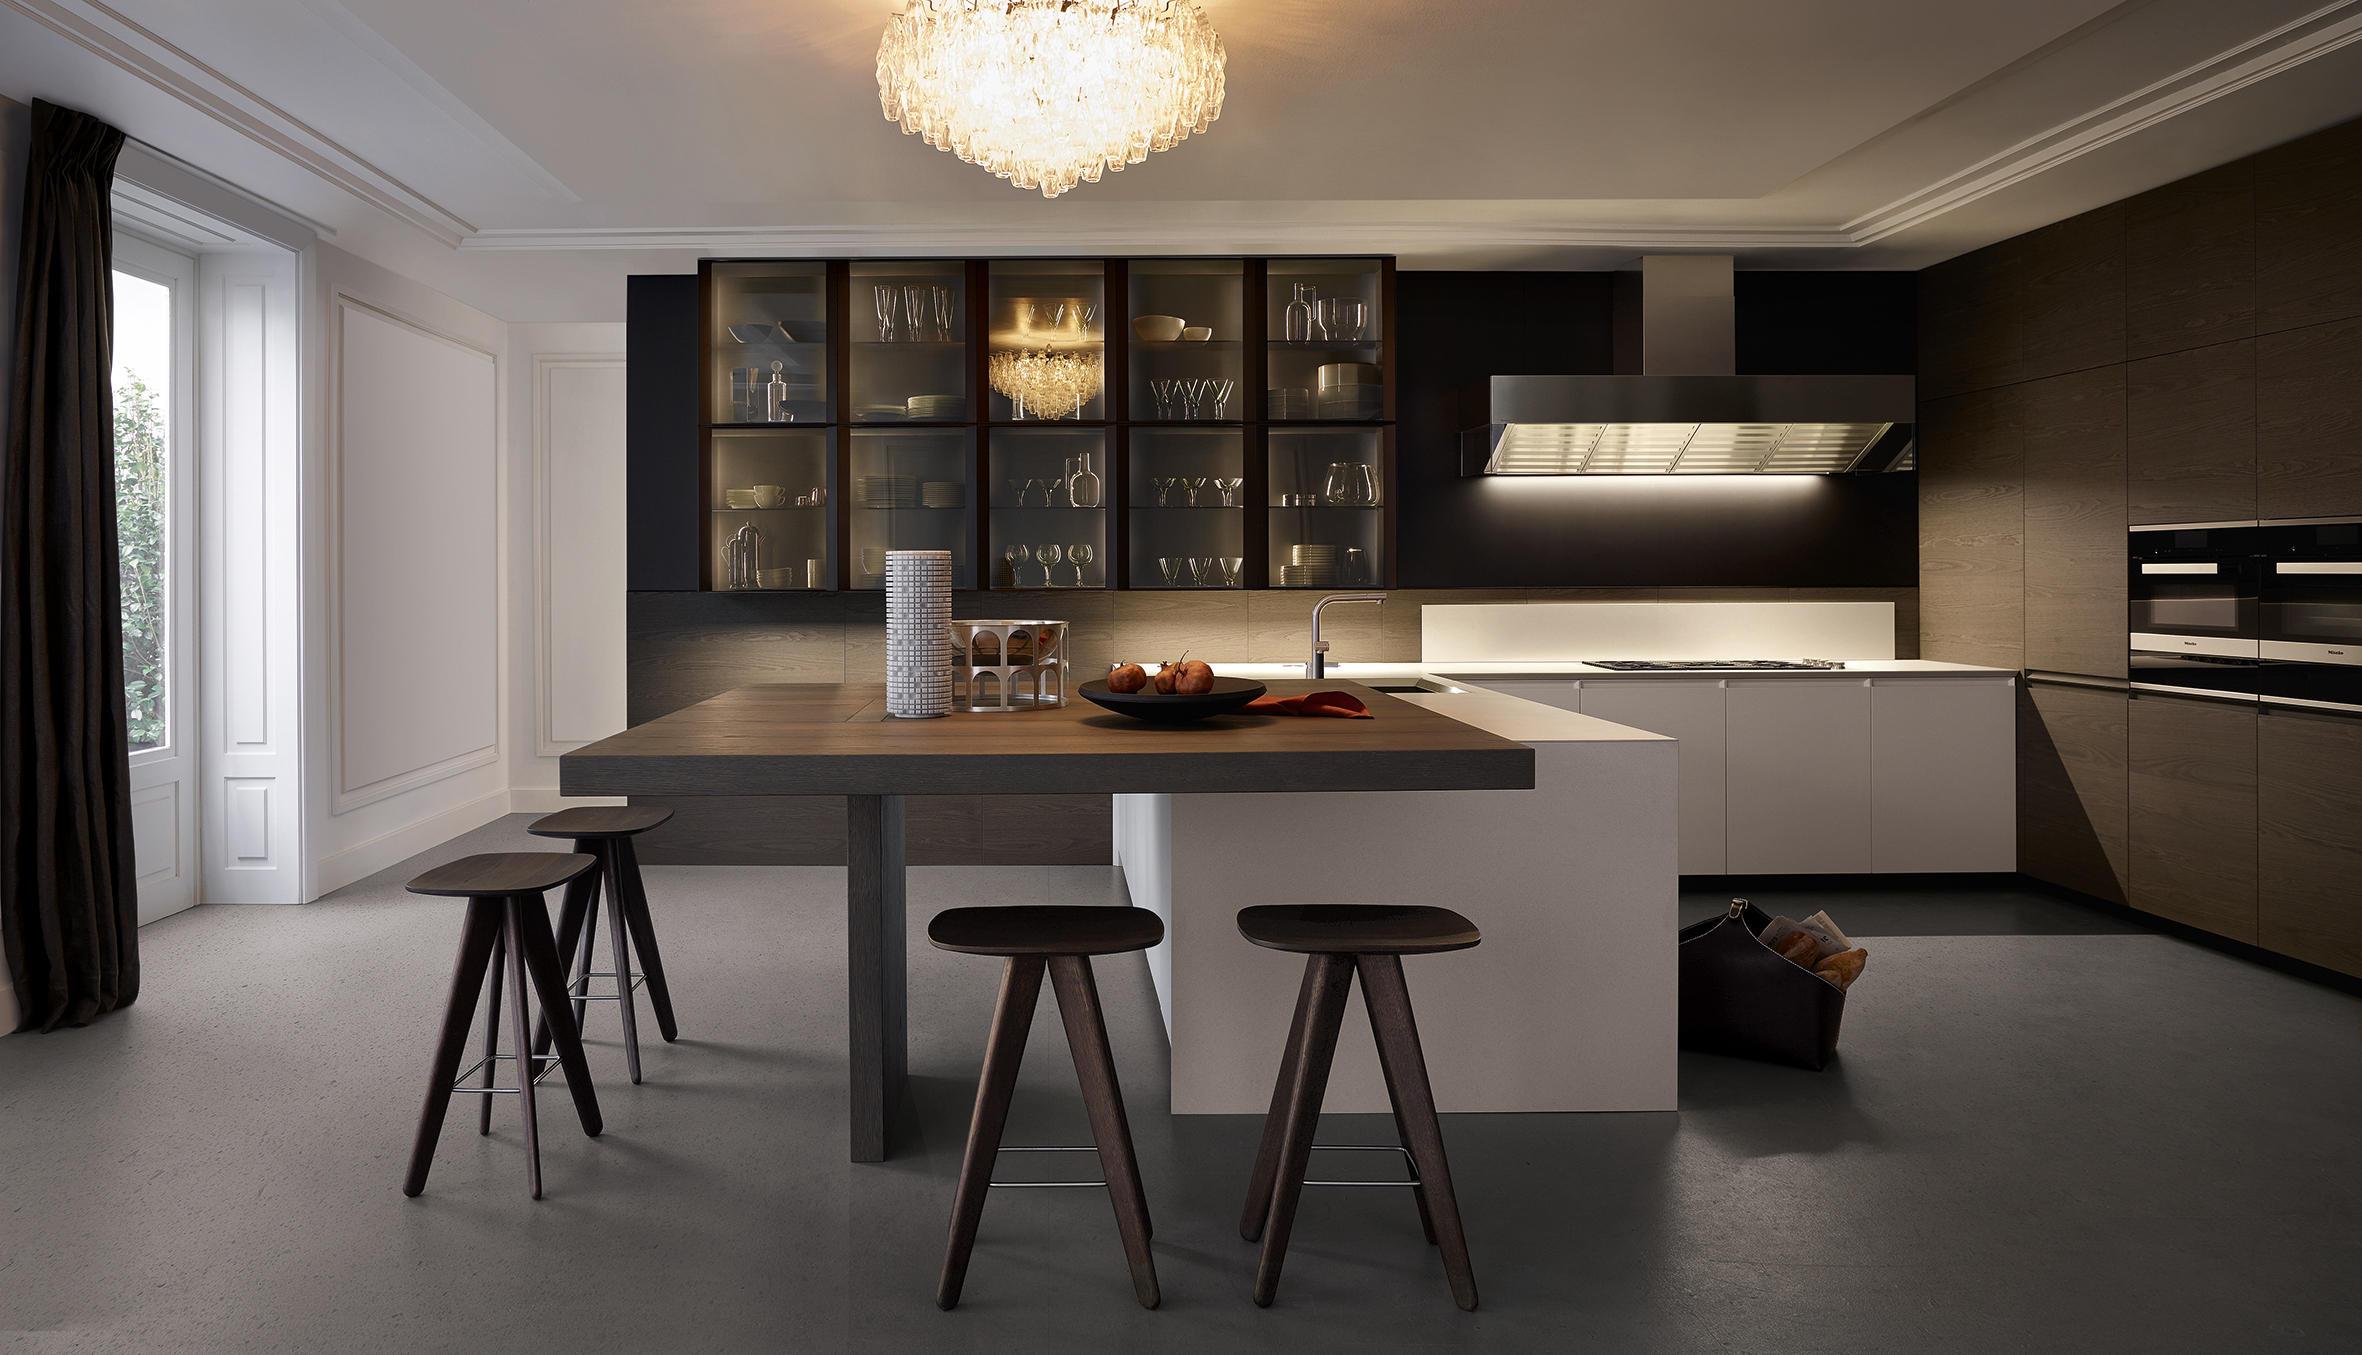 Trail cucine a parete poliform architonic - Cucine a parete ...